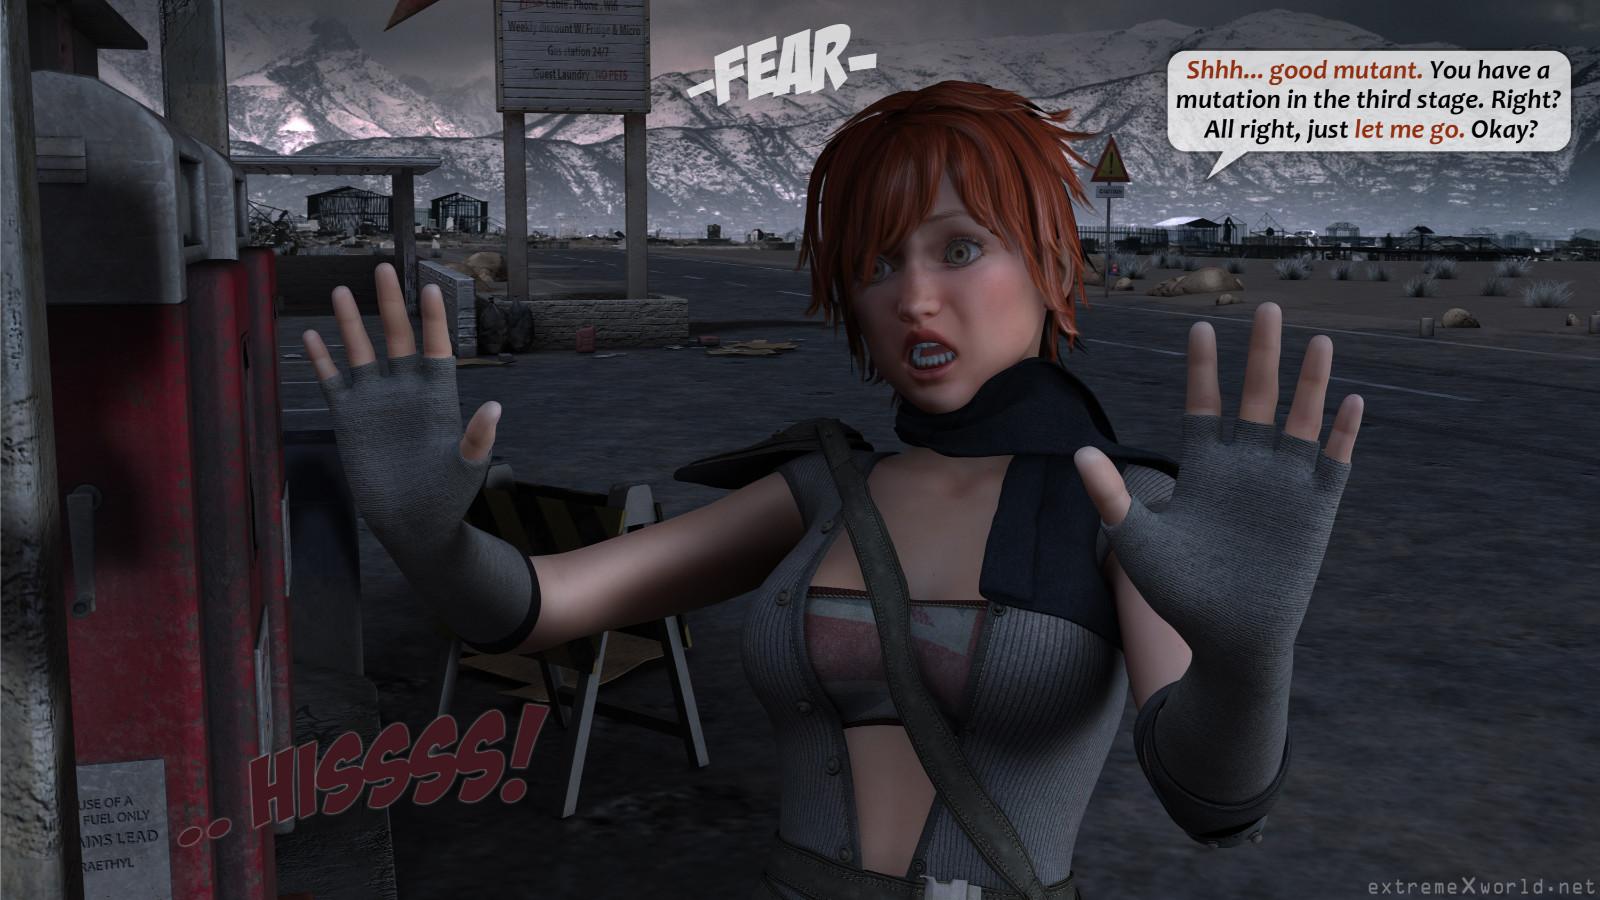 Apocalyptica Porn apocalyptica 2 – extremexworld   sex comics